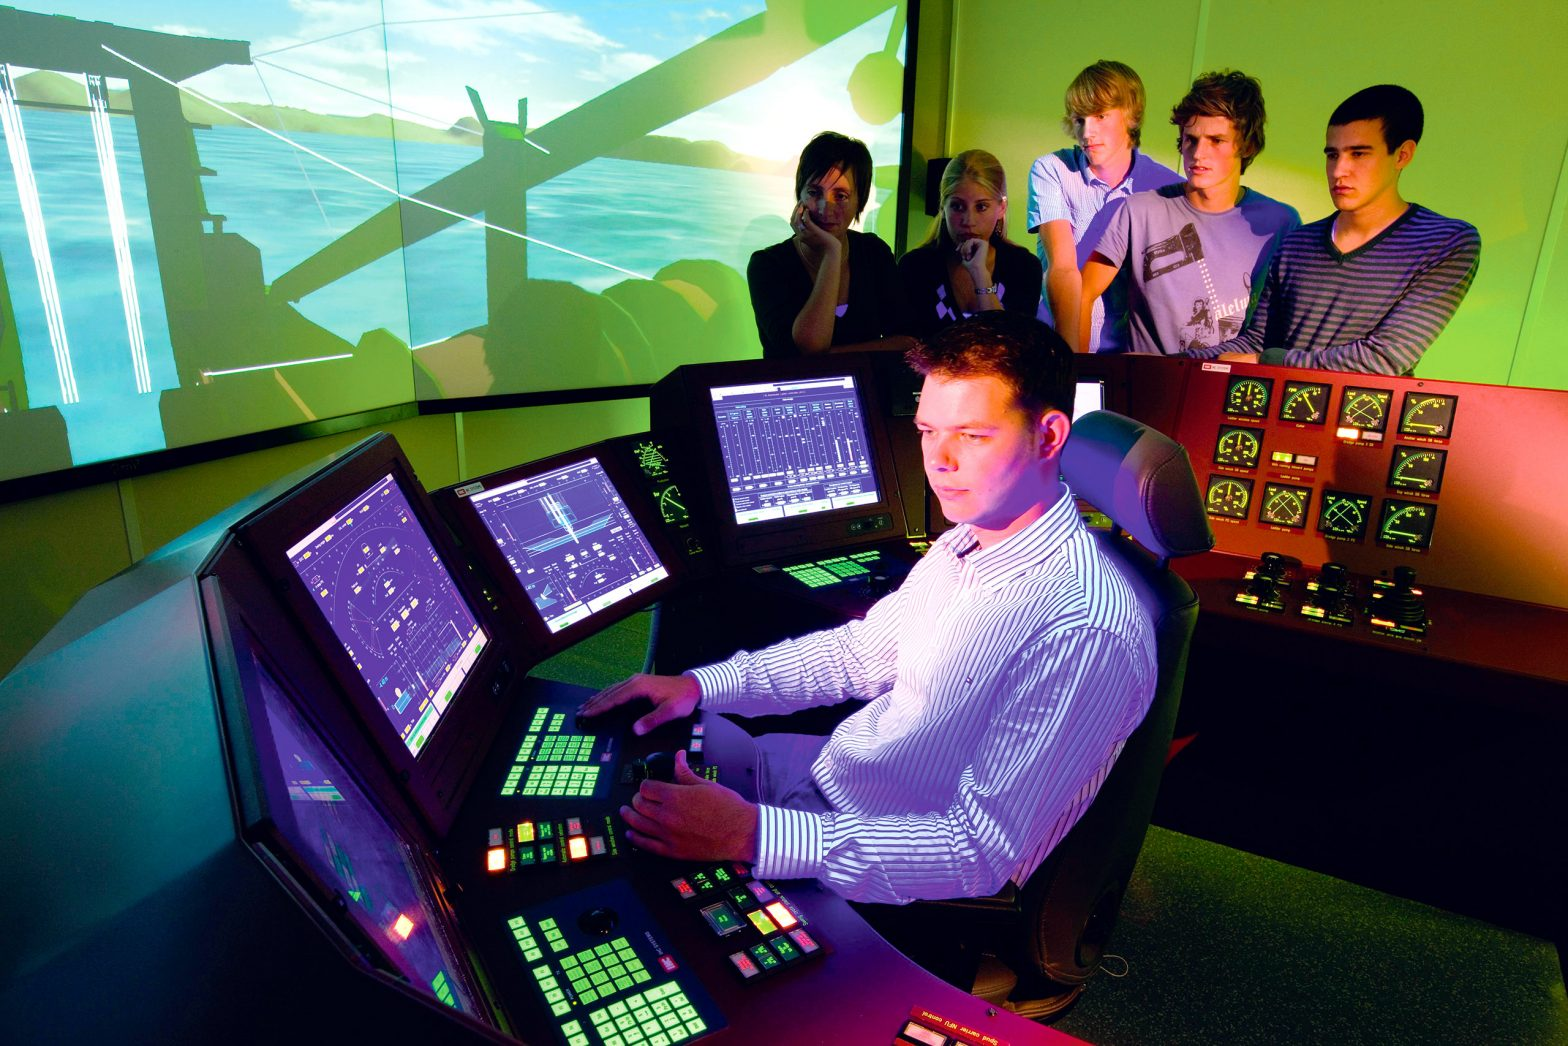 Other high-tech dredging equipment - simulators